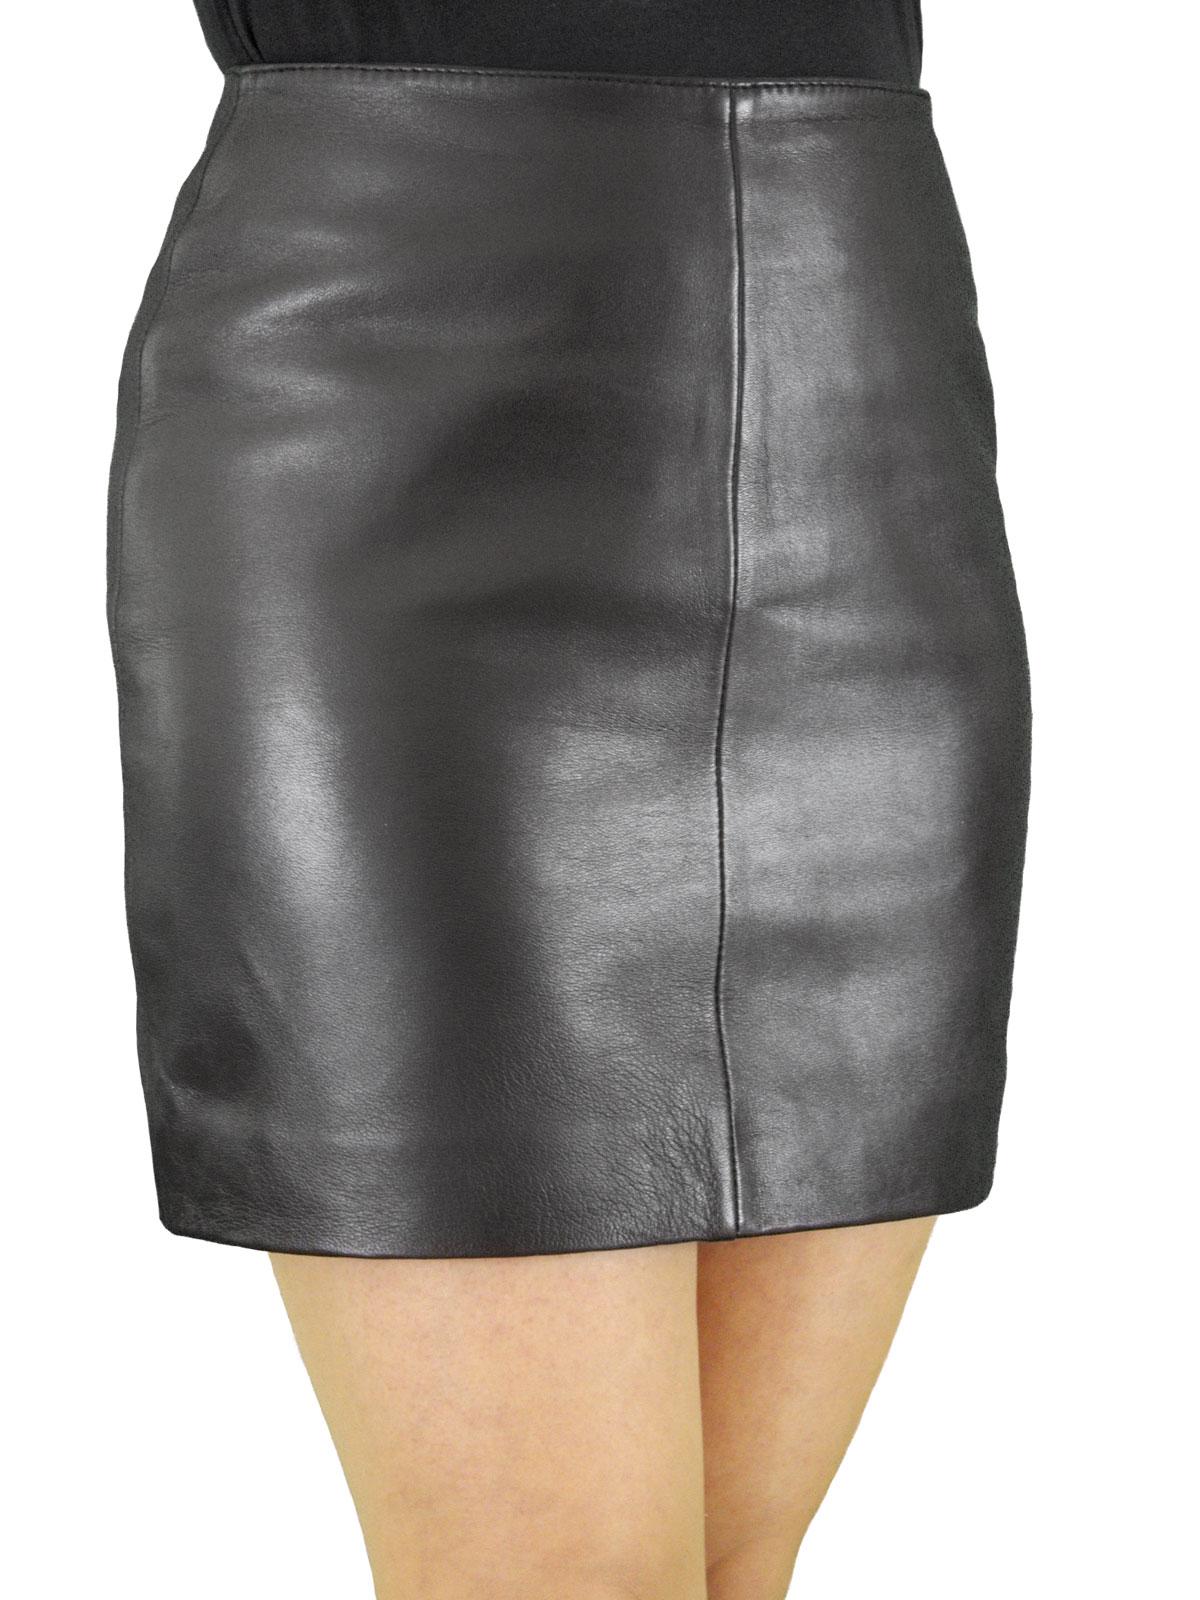 Luxury Soft Leather Mini Skirt - chic classic style - Tout Ensemble